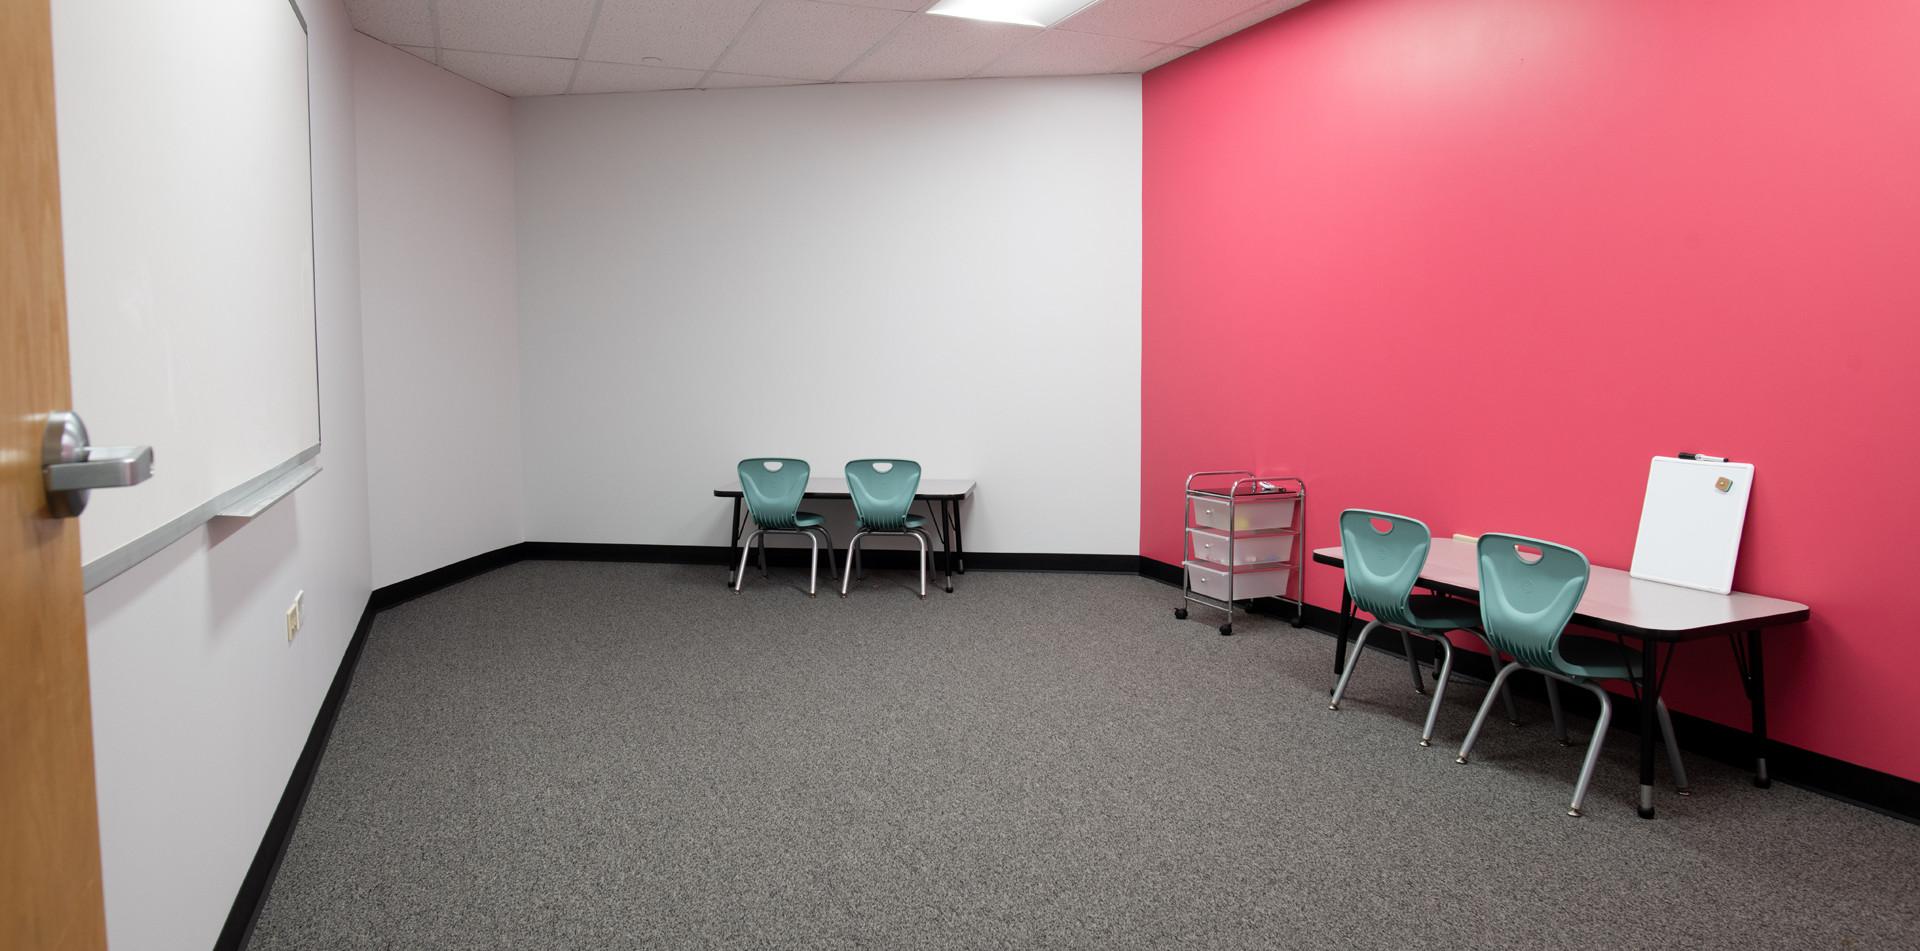 Denver Center Treatment Room 3